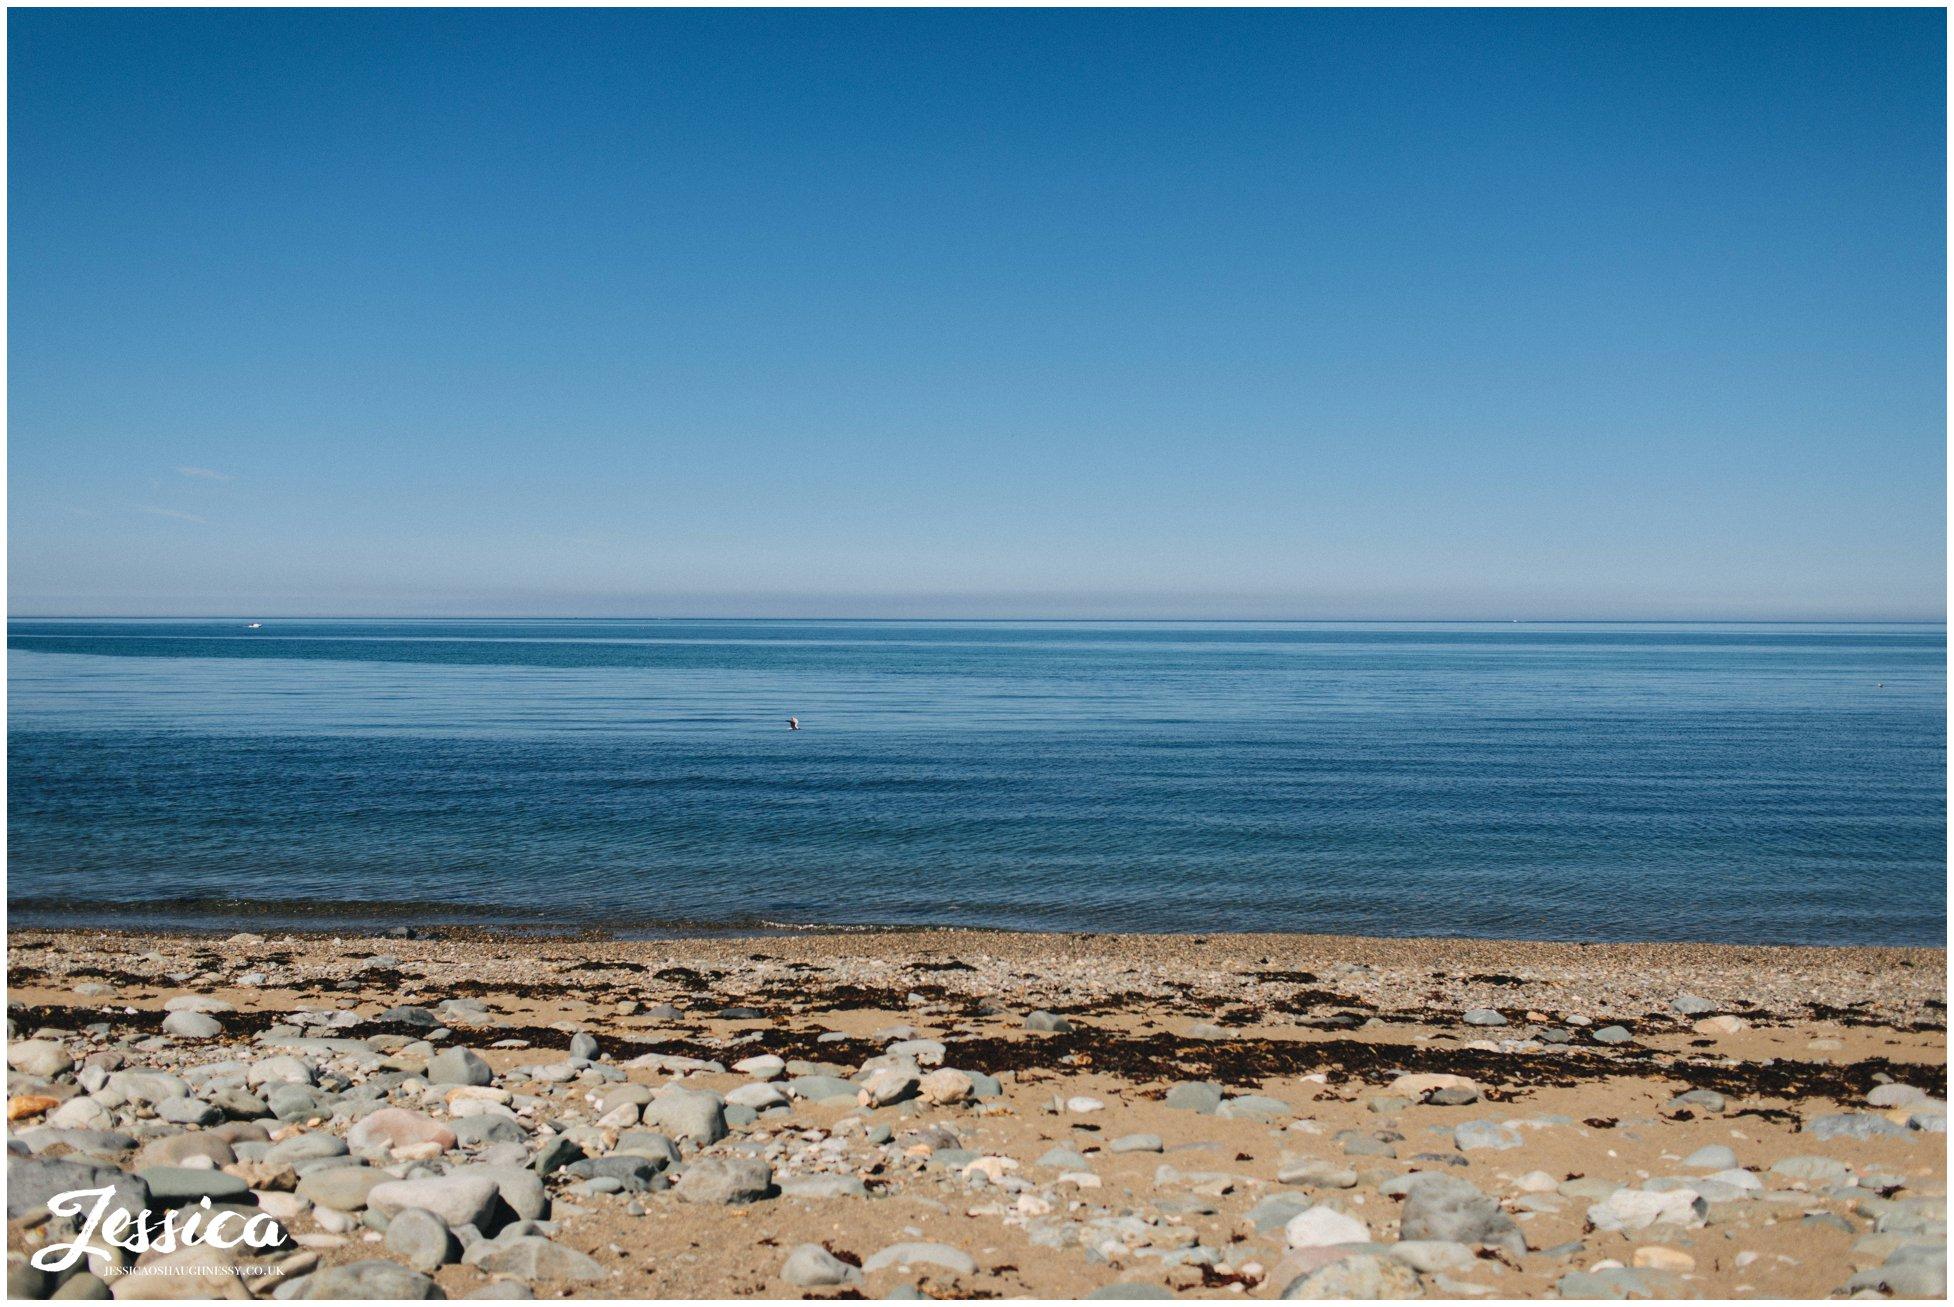 Caernarfon bay with perfect blue skies